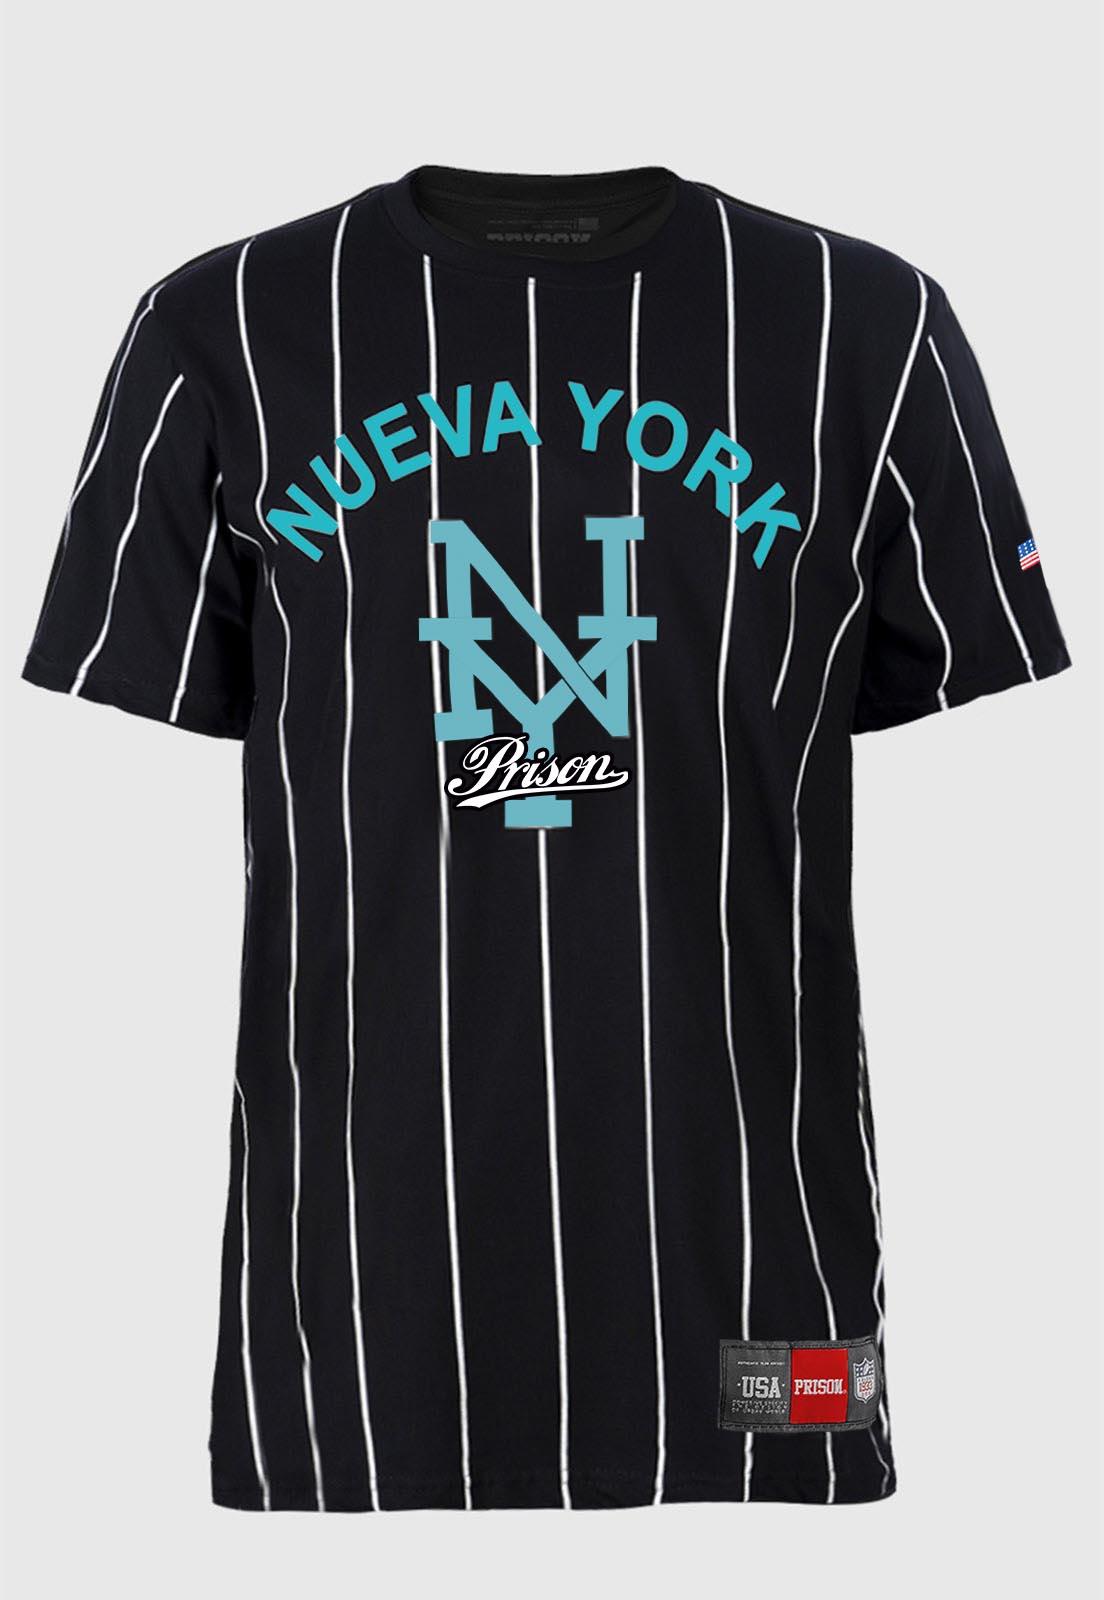 Camiseta Baseball listrada Prison Nueva York Exclusiva